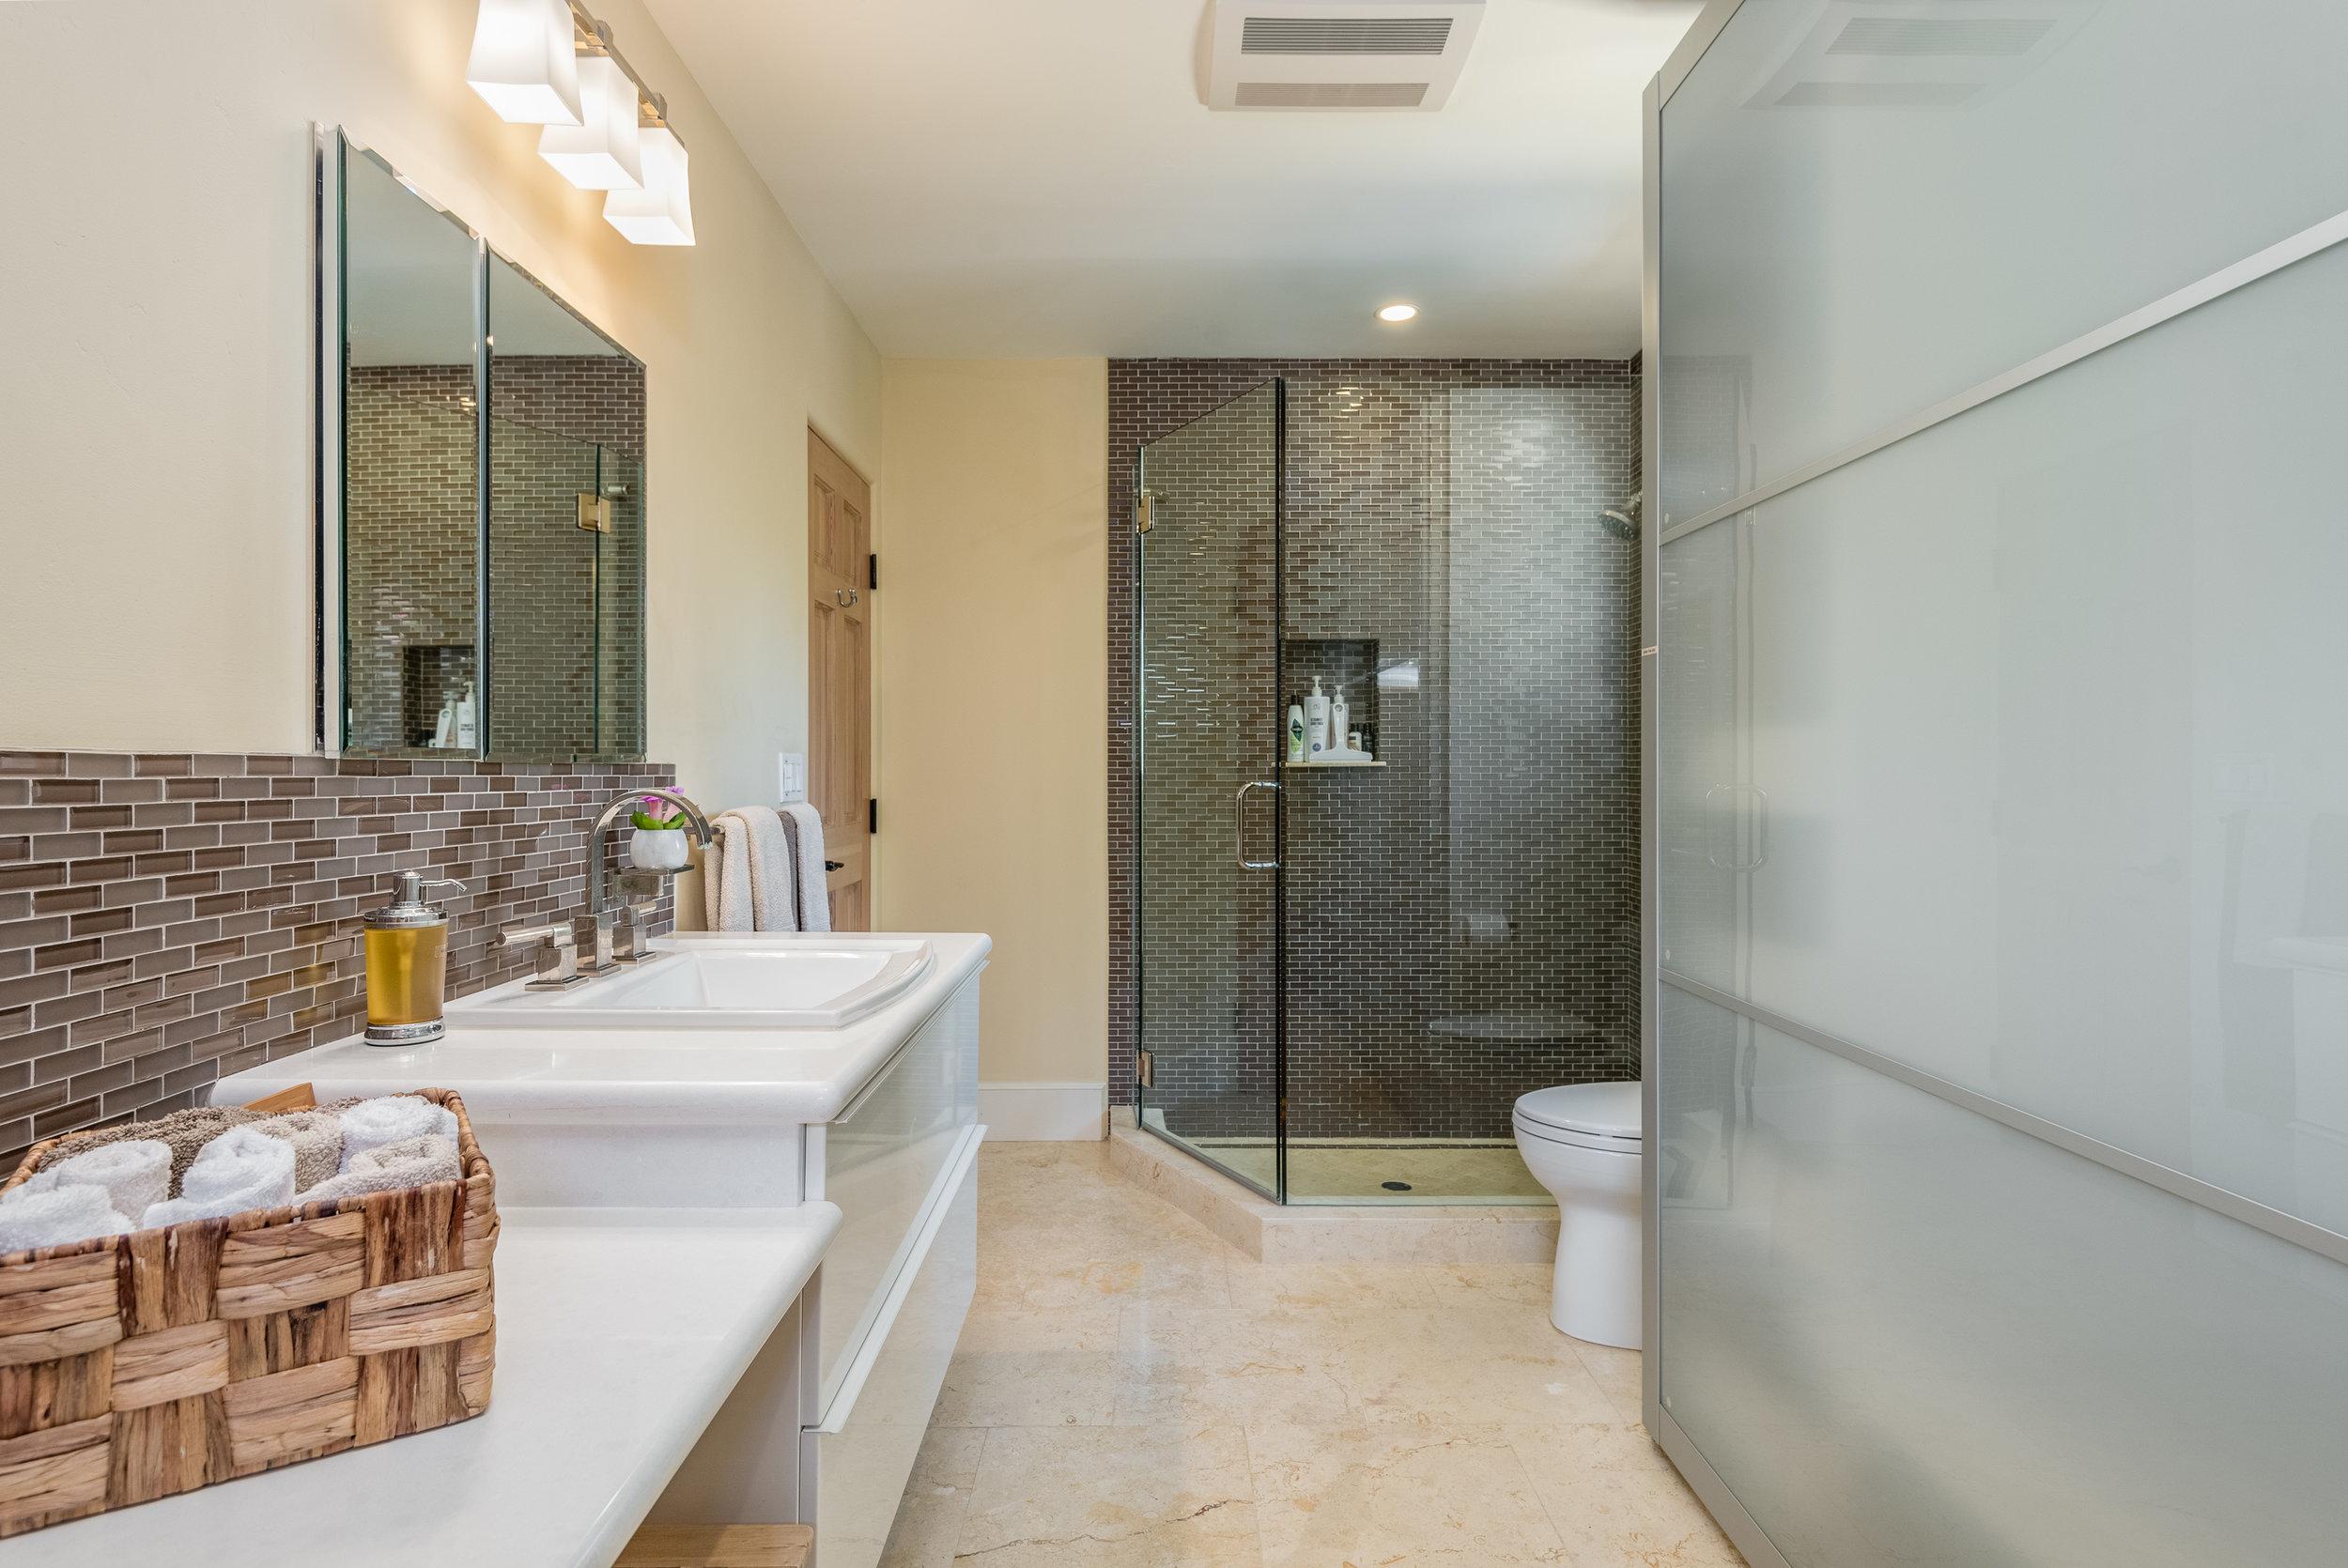 20-Bathroom 2.jpg